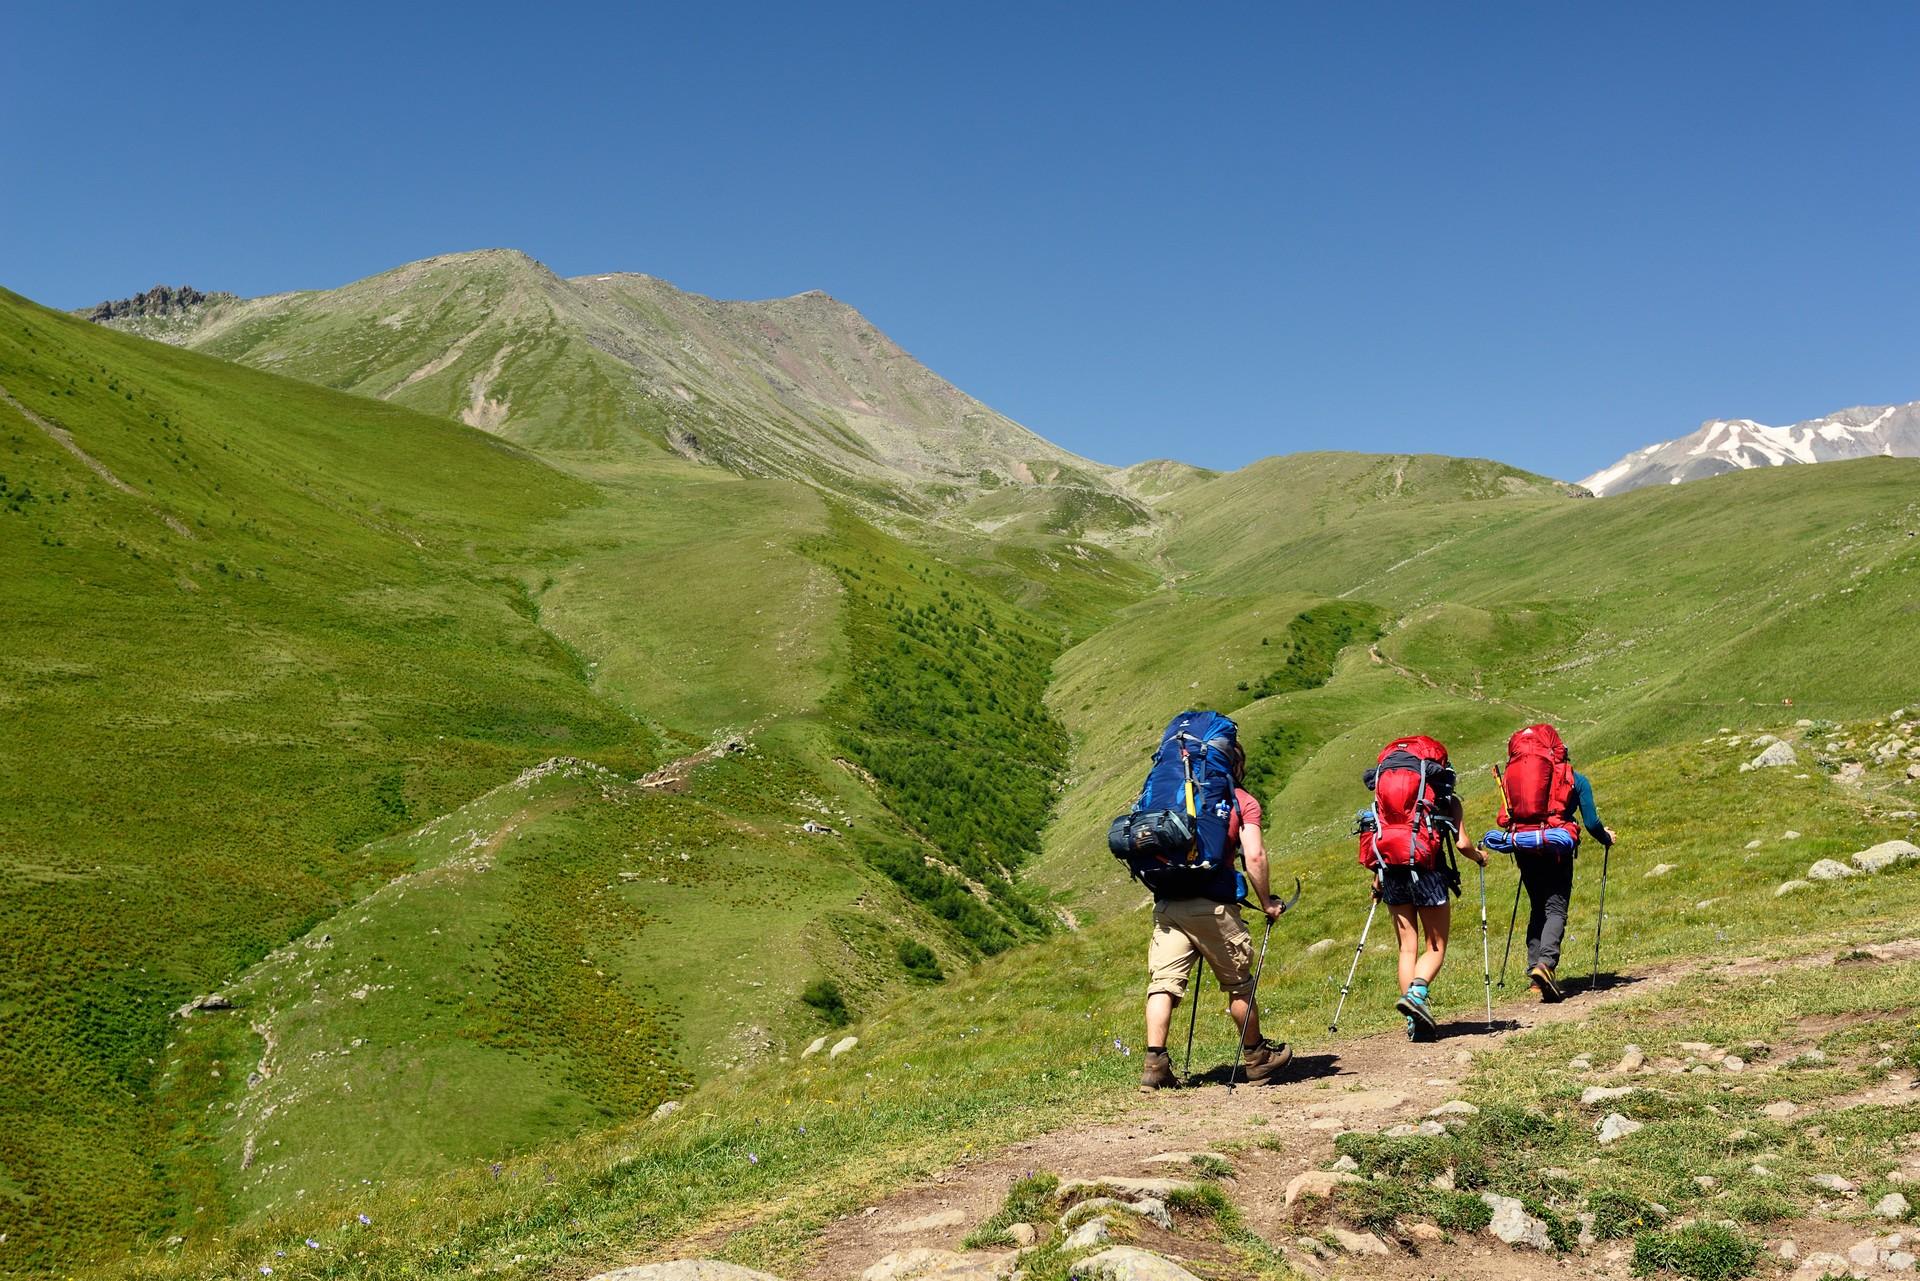 Hikers walking through the Kazbegi region of Georgia